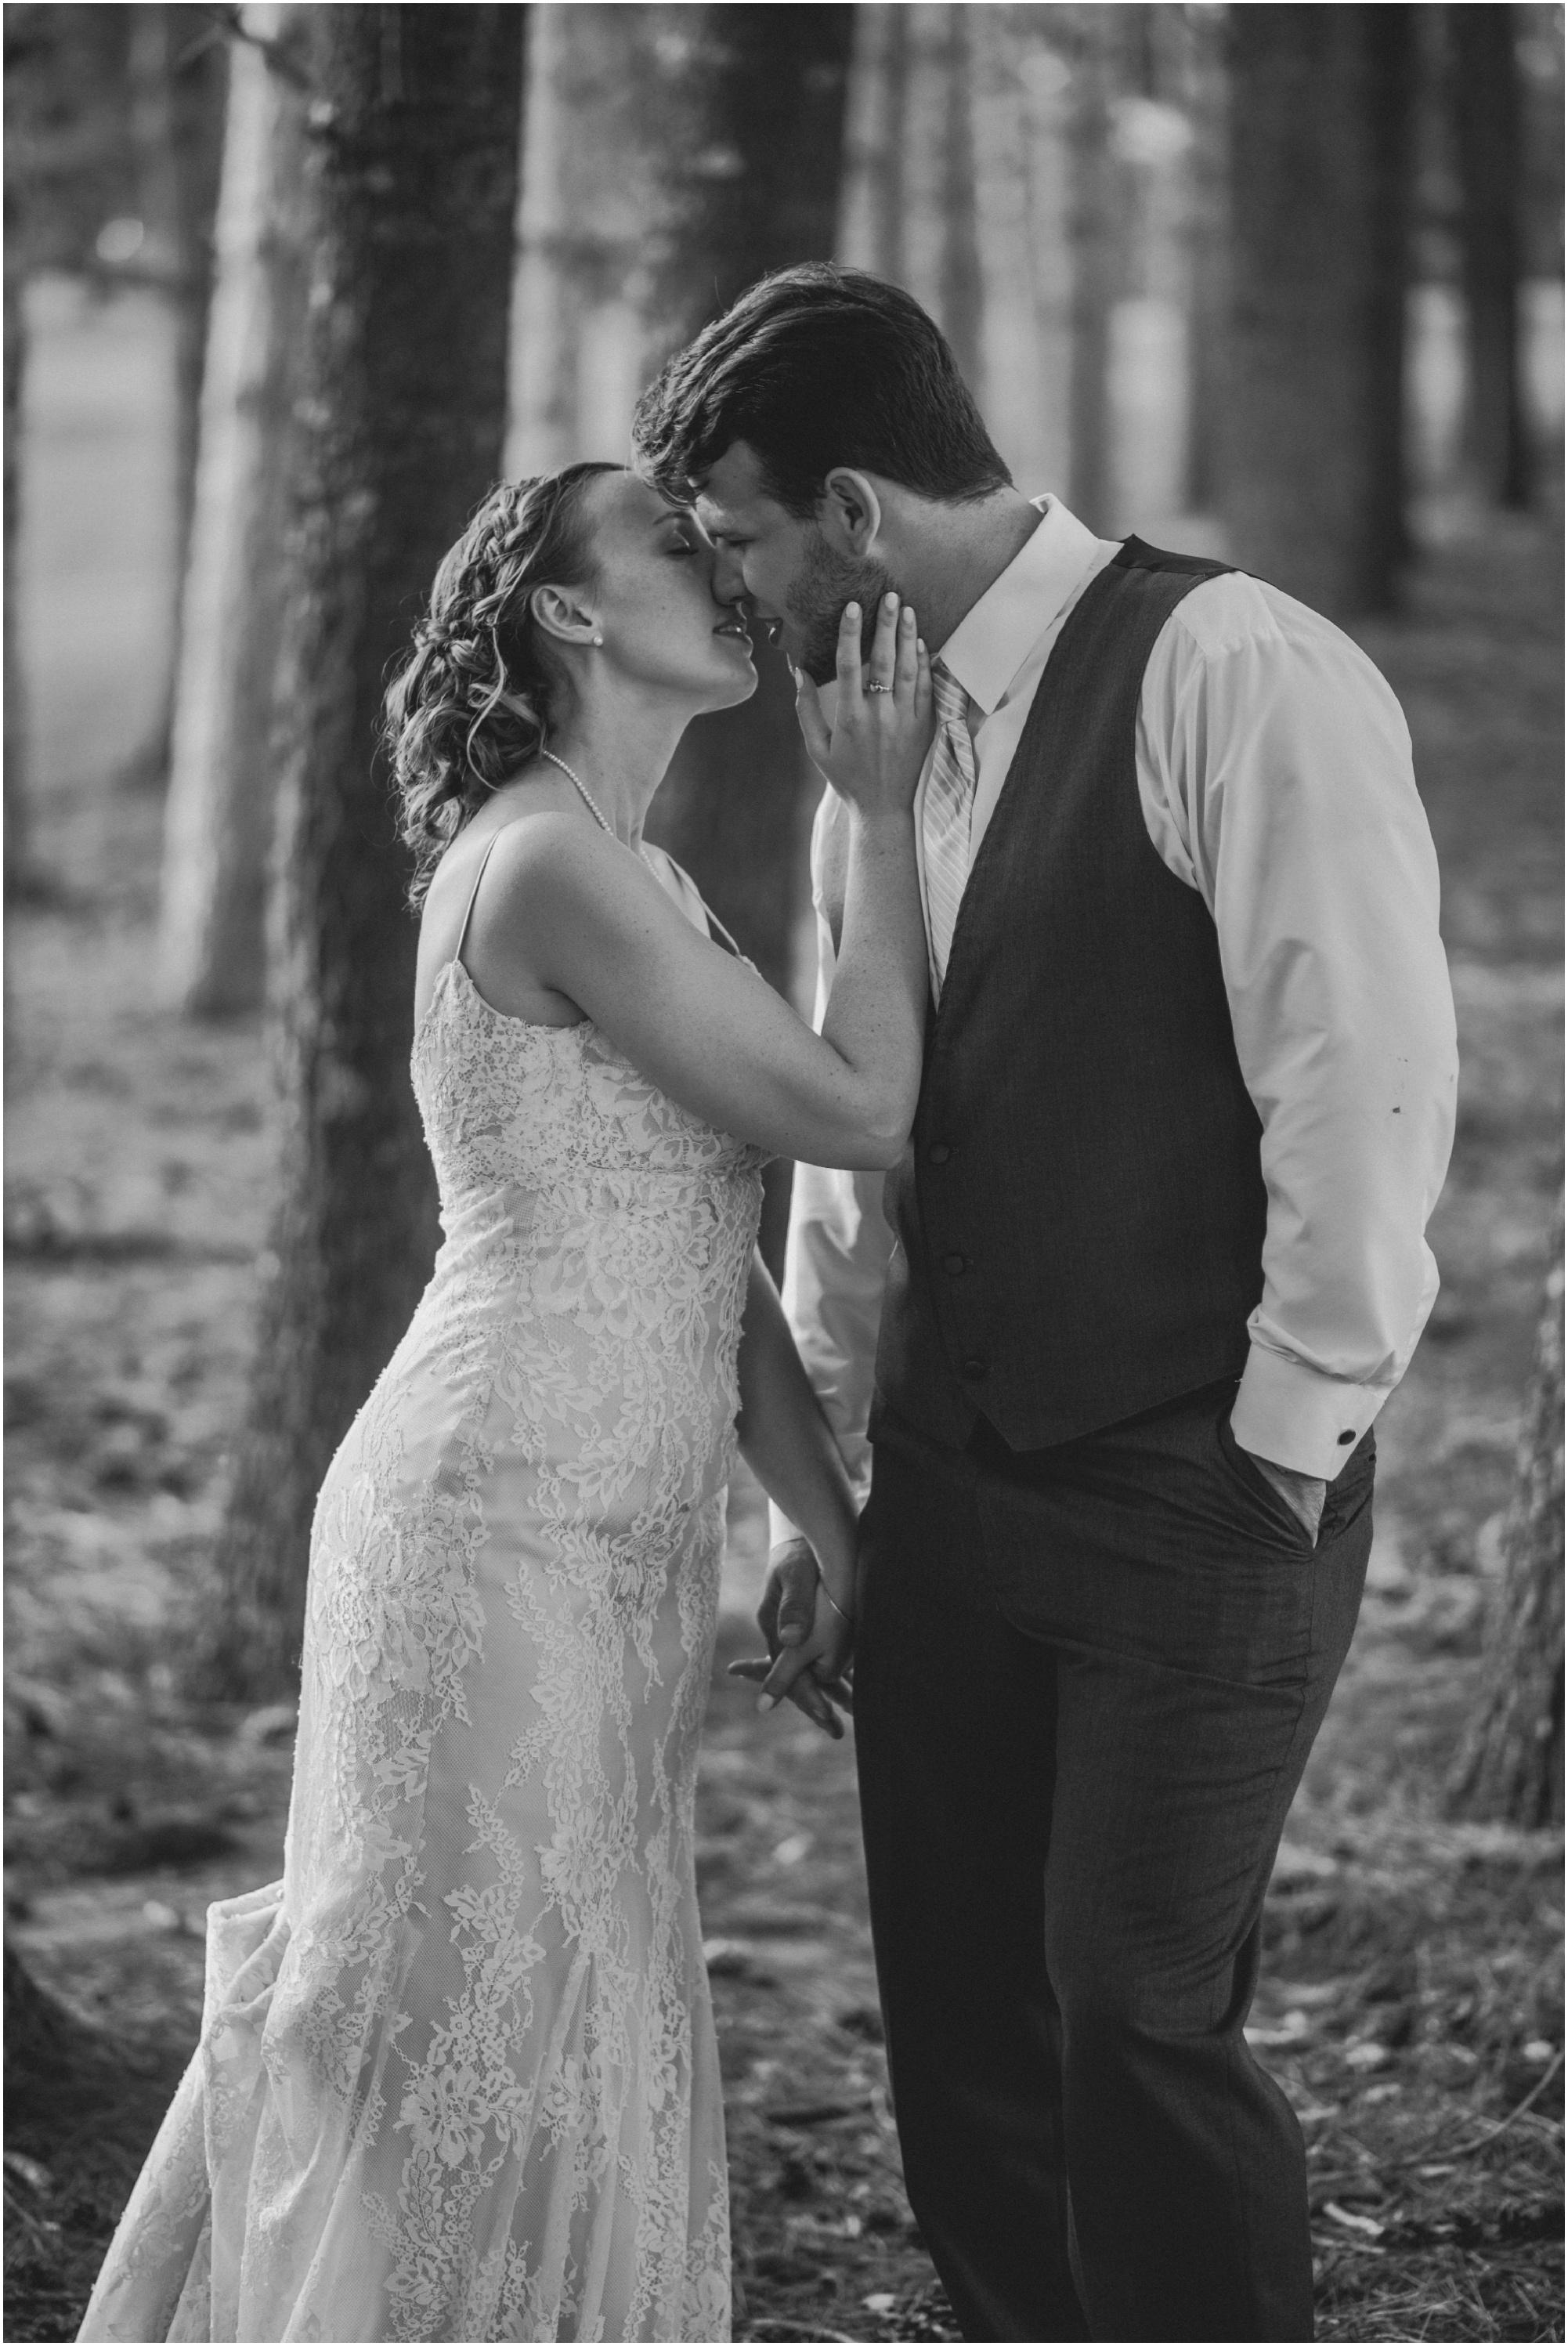 Wisconsin-Wedding-Photographer-Reedsburg-Country-Club-Kaela-and Matt-Wedding-863.jpg